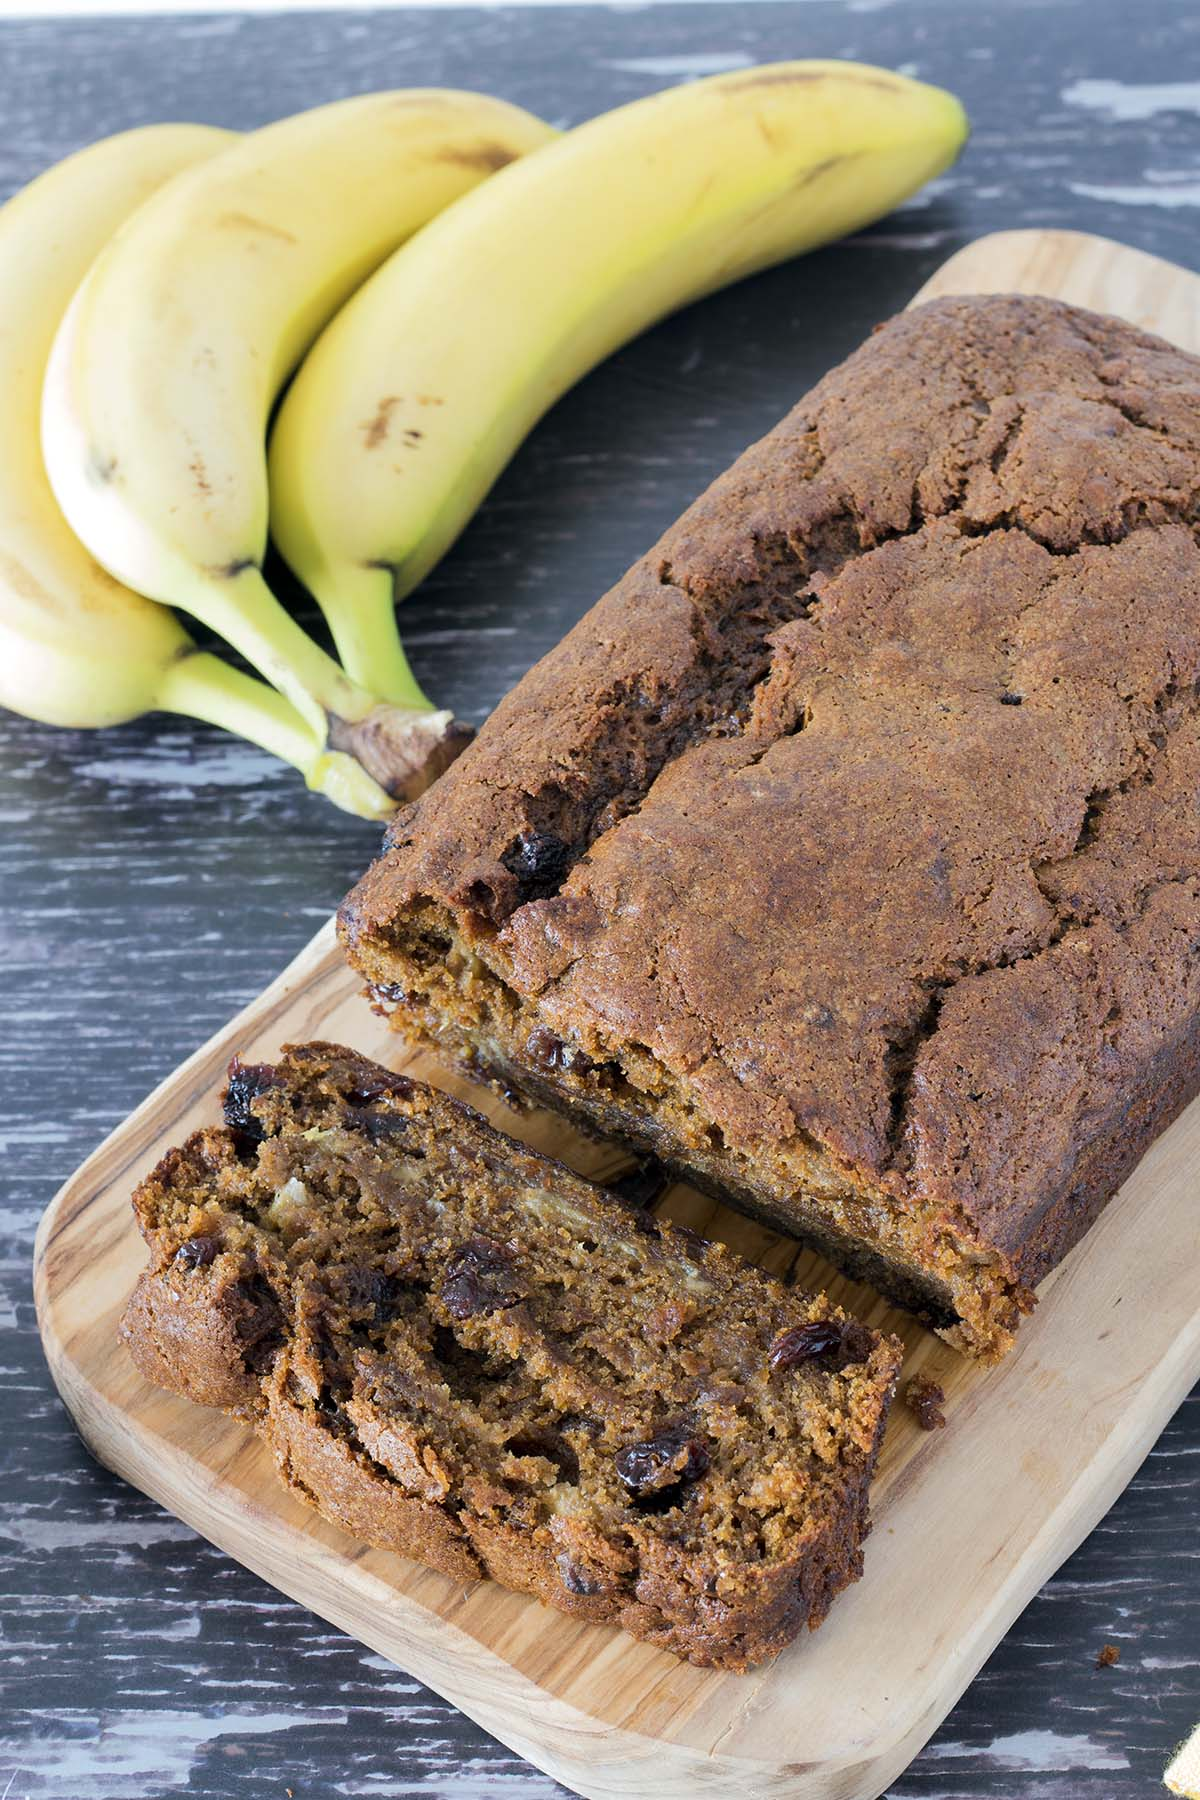 Spiced banana bread (vegan) recipe by Cook Veggielicious.